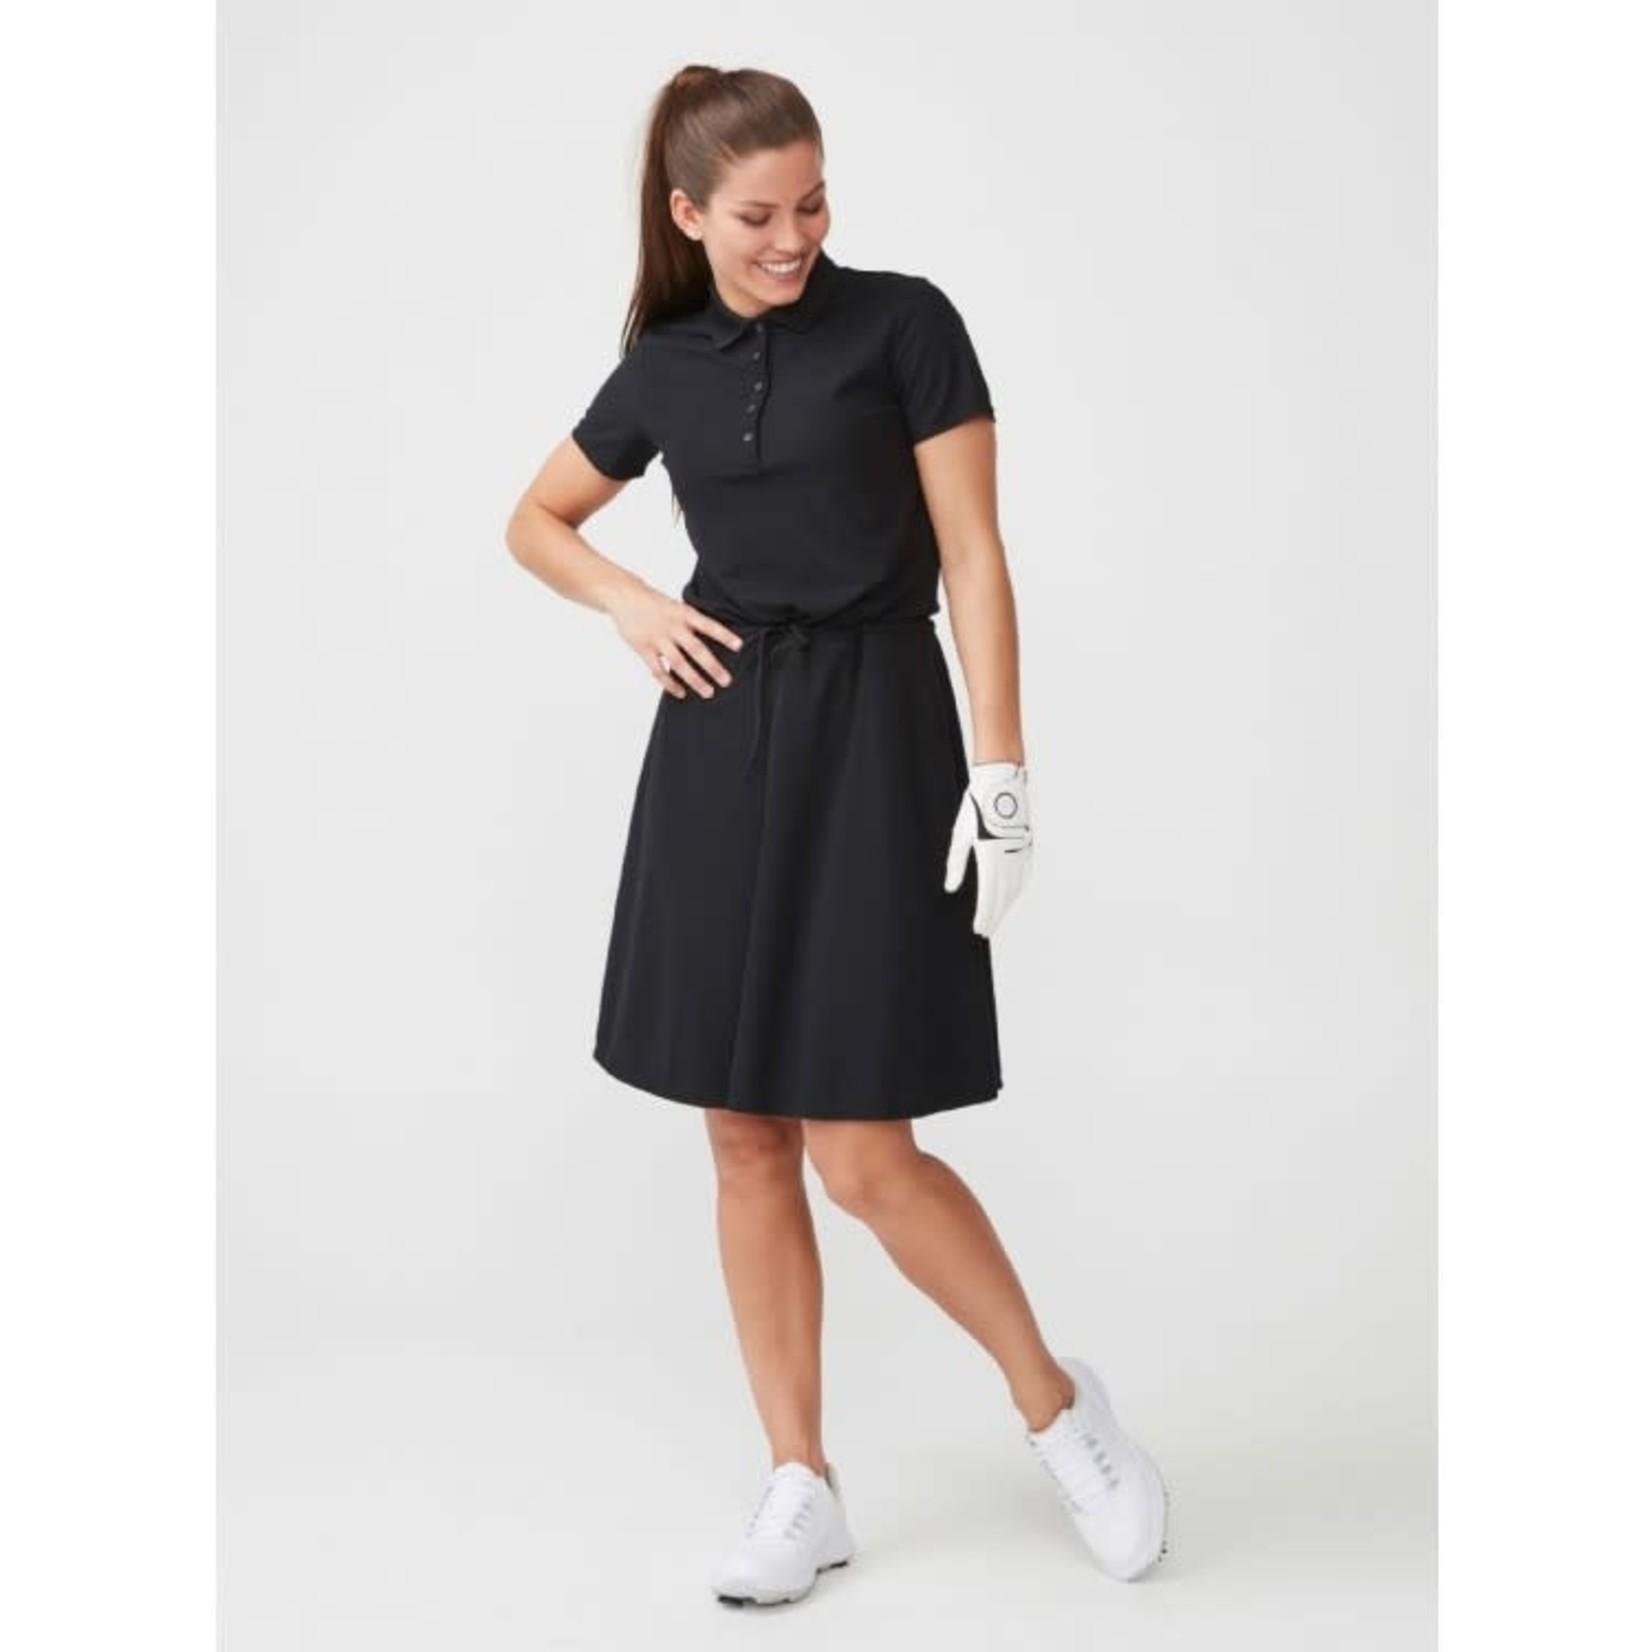 Rohnisch Rohnisch Soft Func Dress Black XL